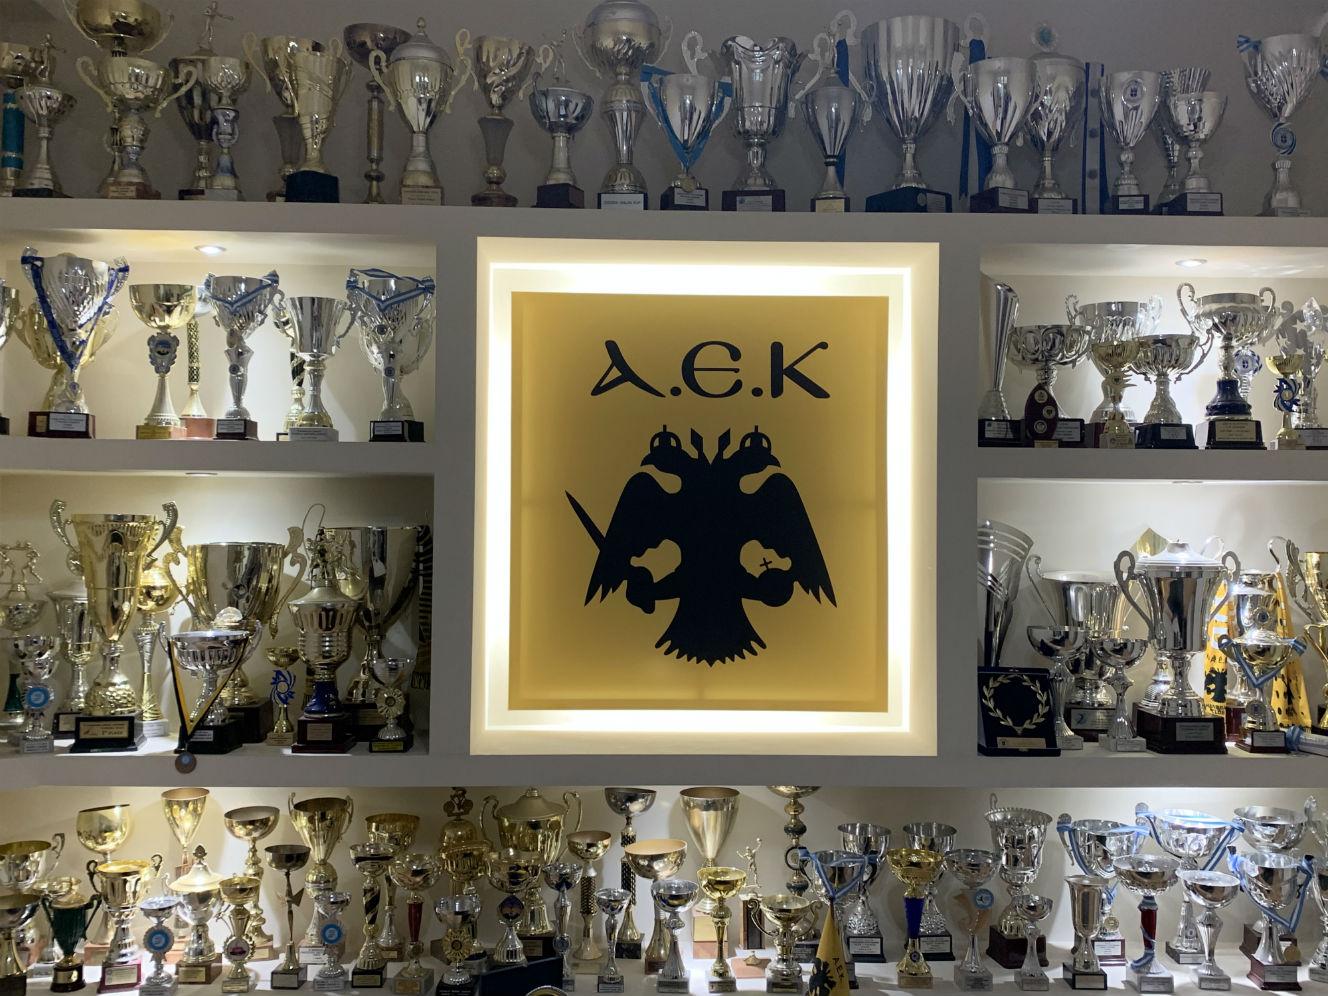 aek trophy room-tropaia-kipella1111